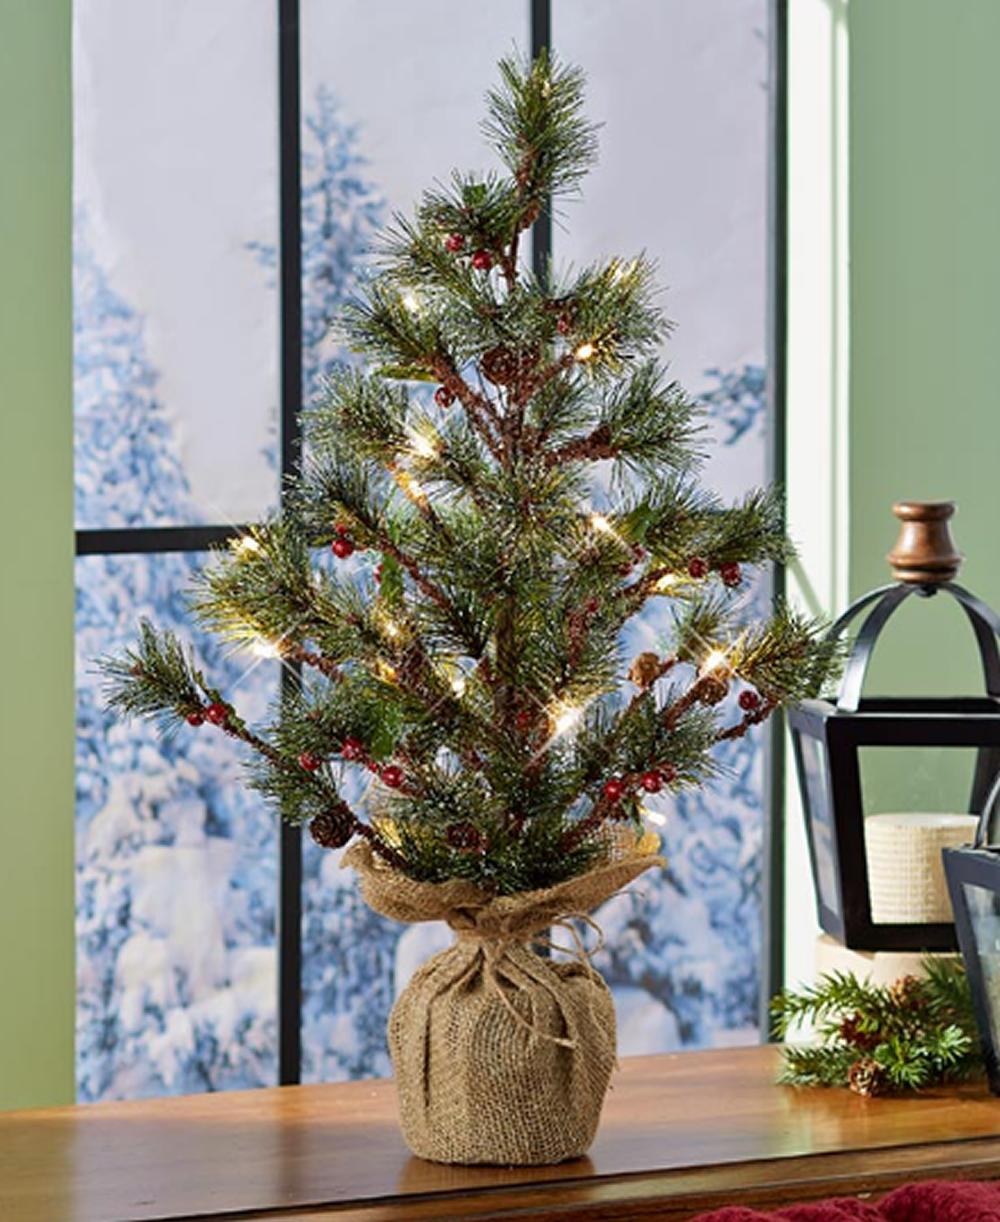 Lighted Christmas Tree Seasonal Display Woodland Holiday